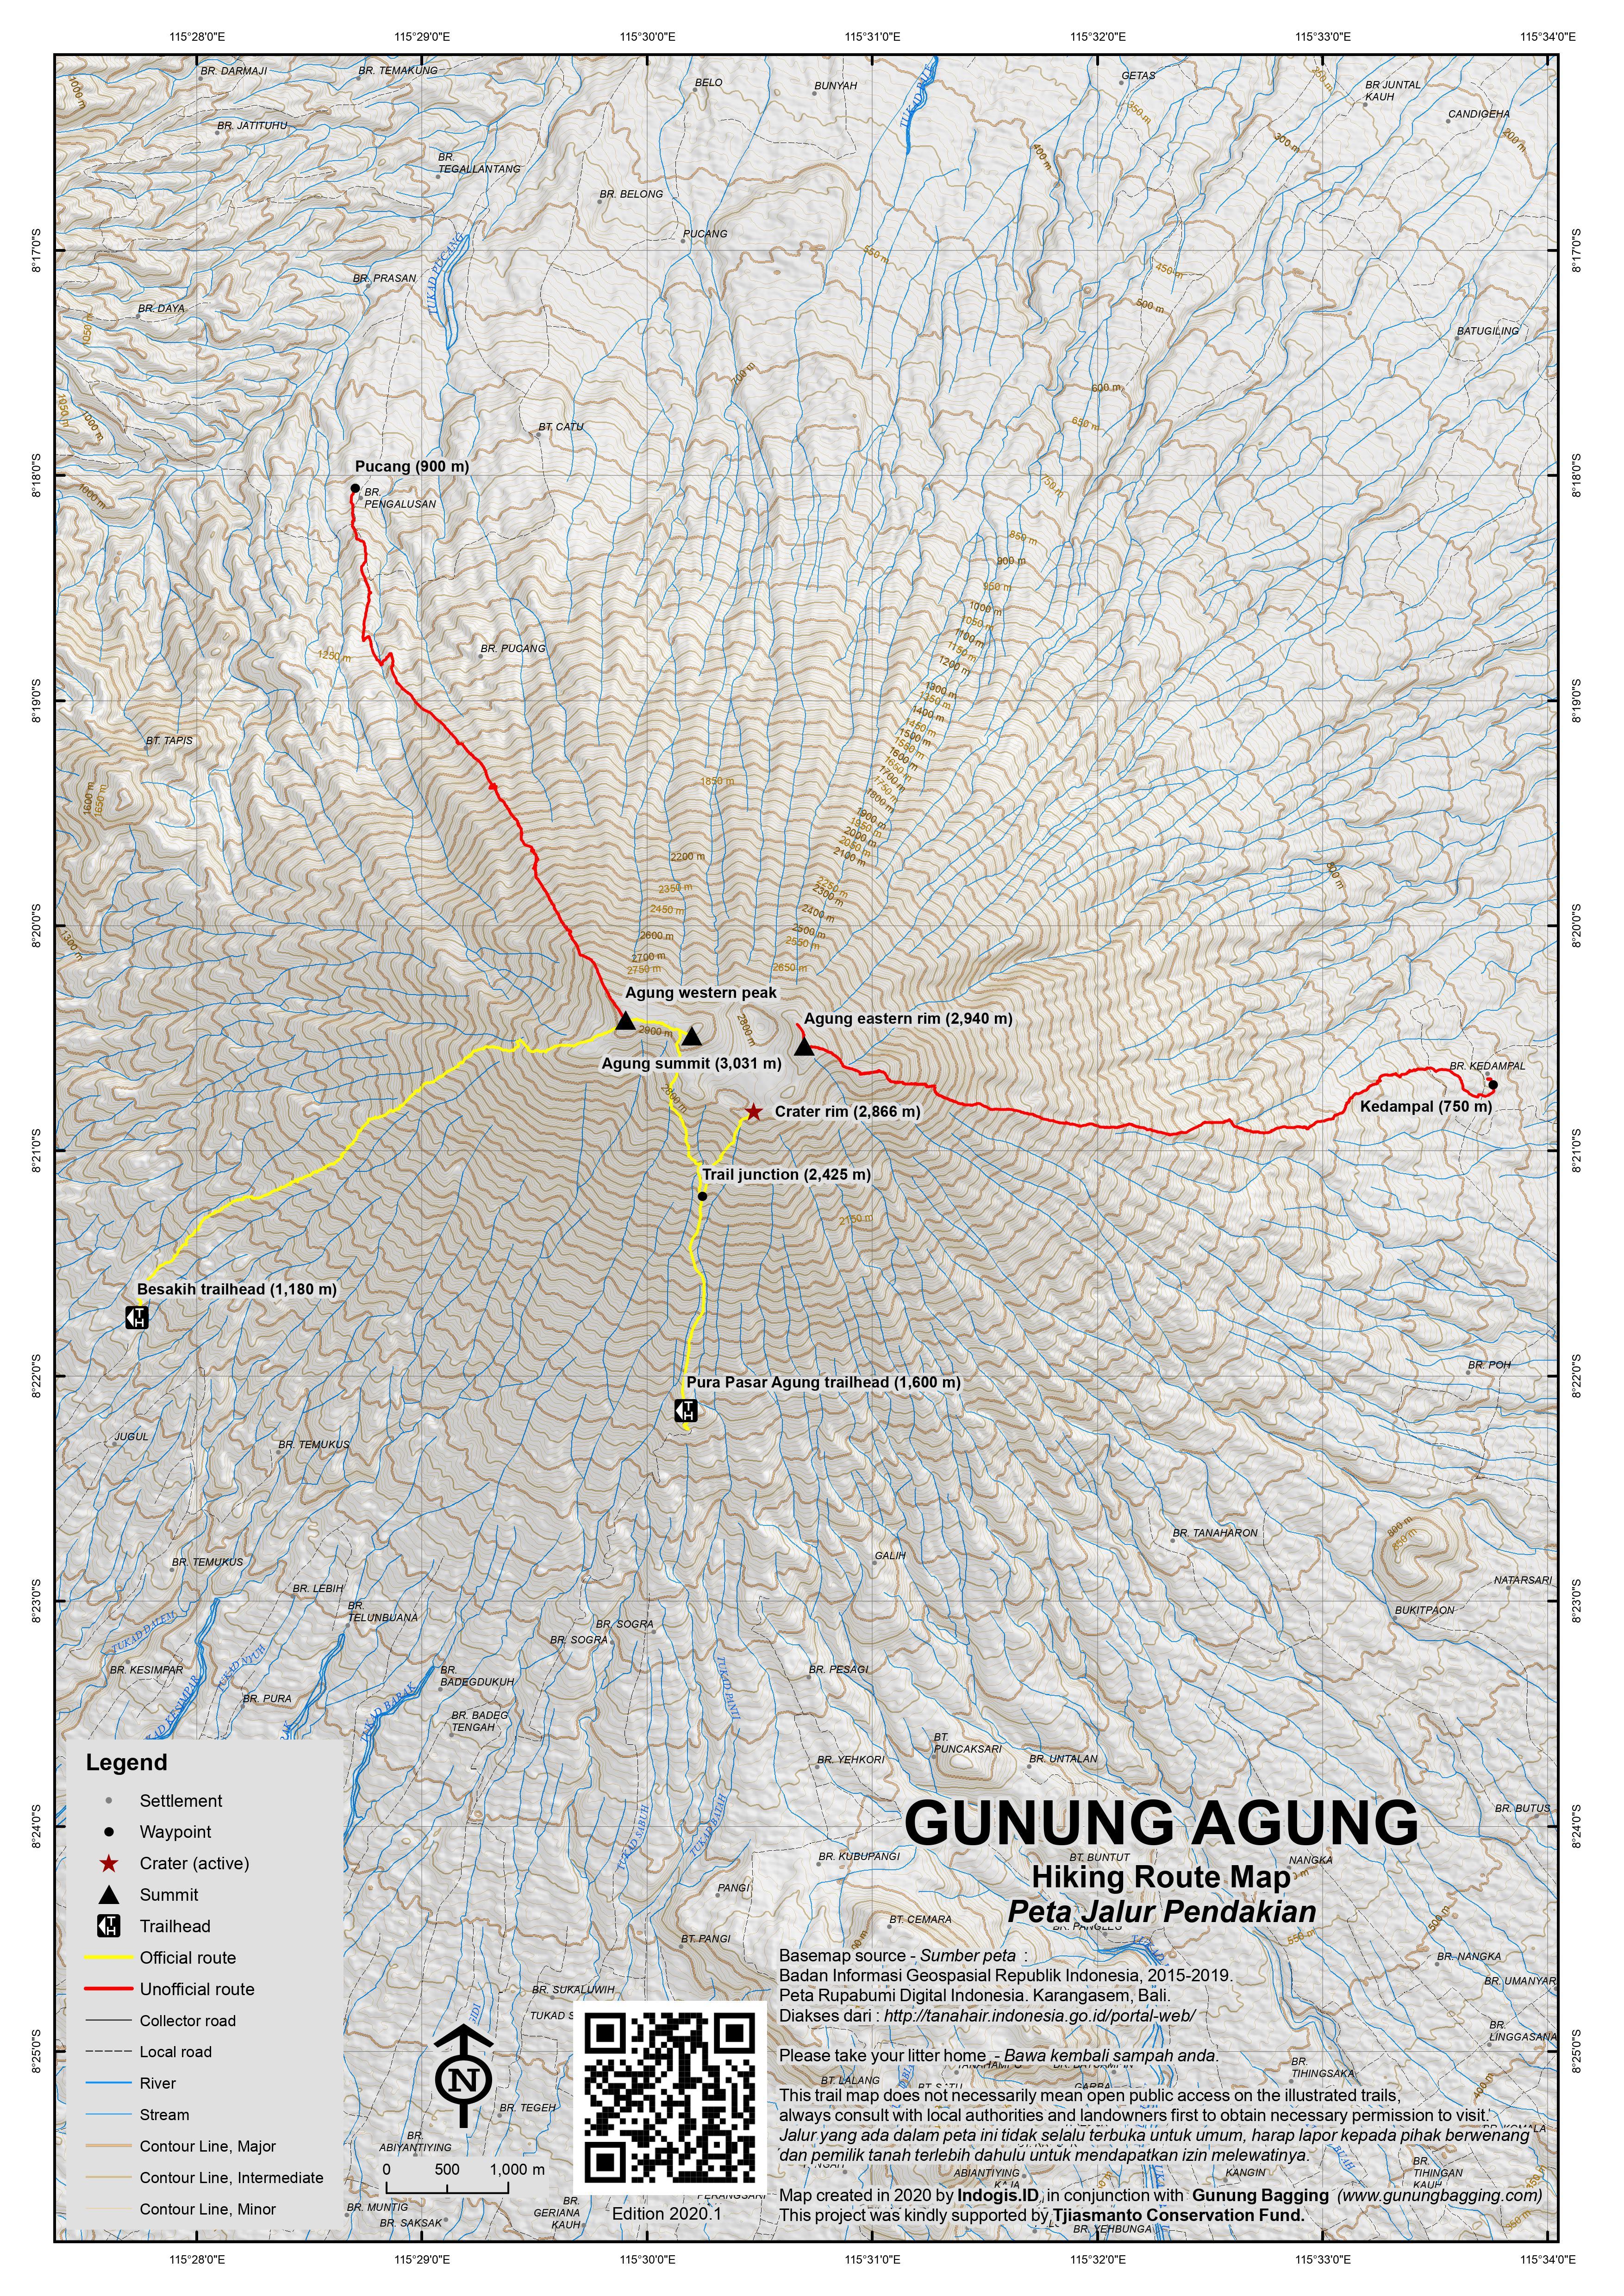 Peta Jalur Pendakian Gunung Agung